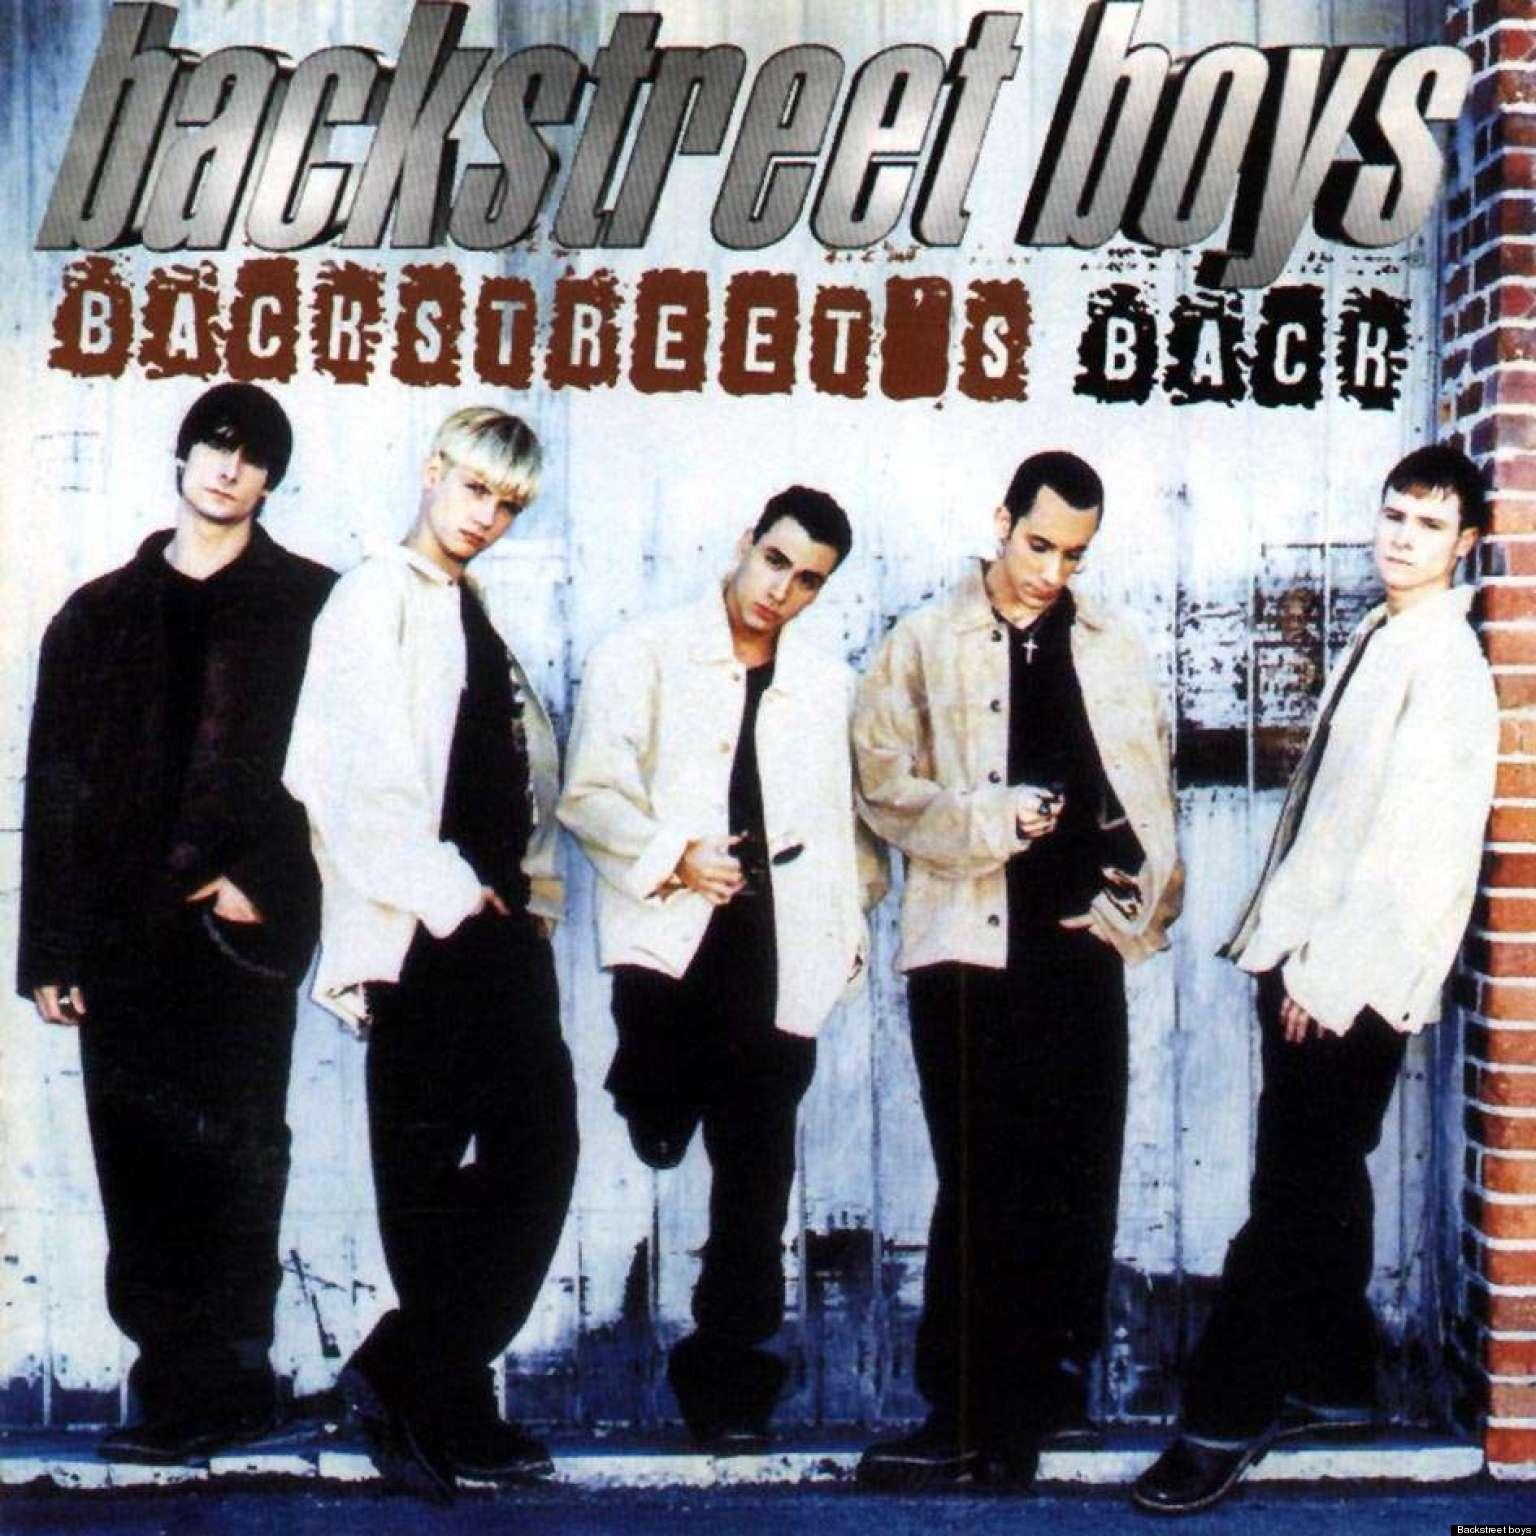 backstreet boys - photo #25